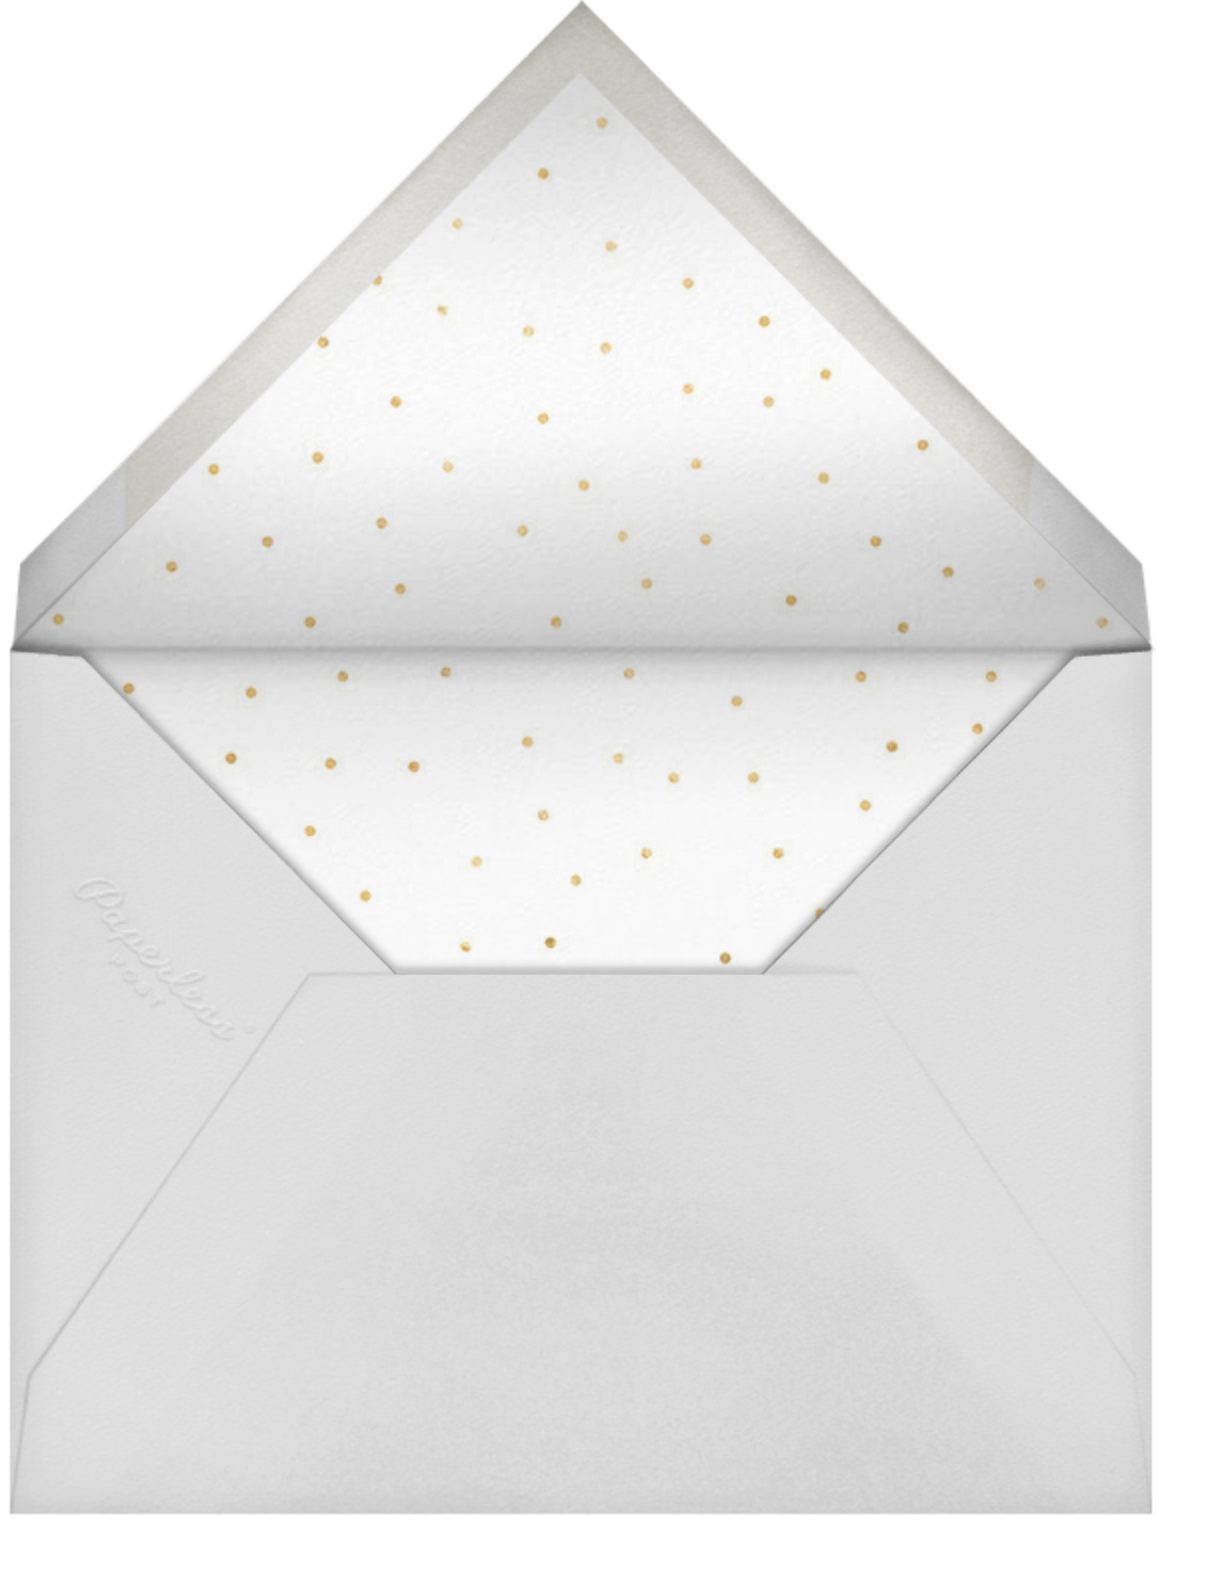 Firework - Satin Gold - Paperless Post - Professional events - envelope back